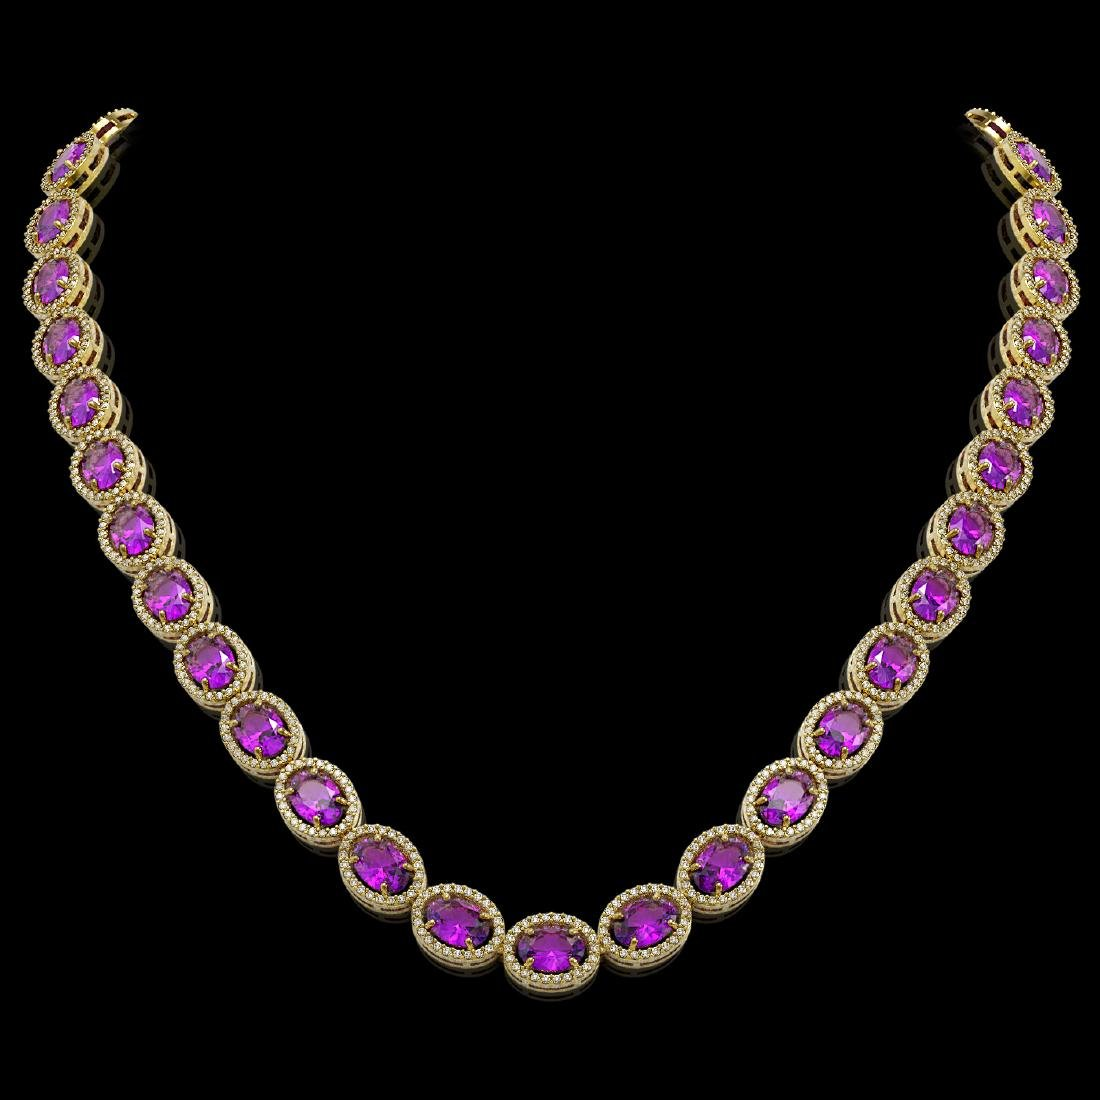 45.16 CTW Amethyst & Diamond Halo Necklace 10K Yellow